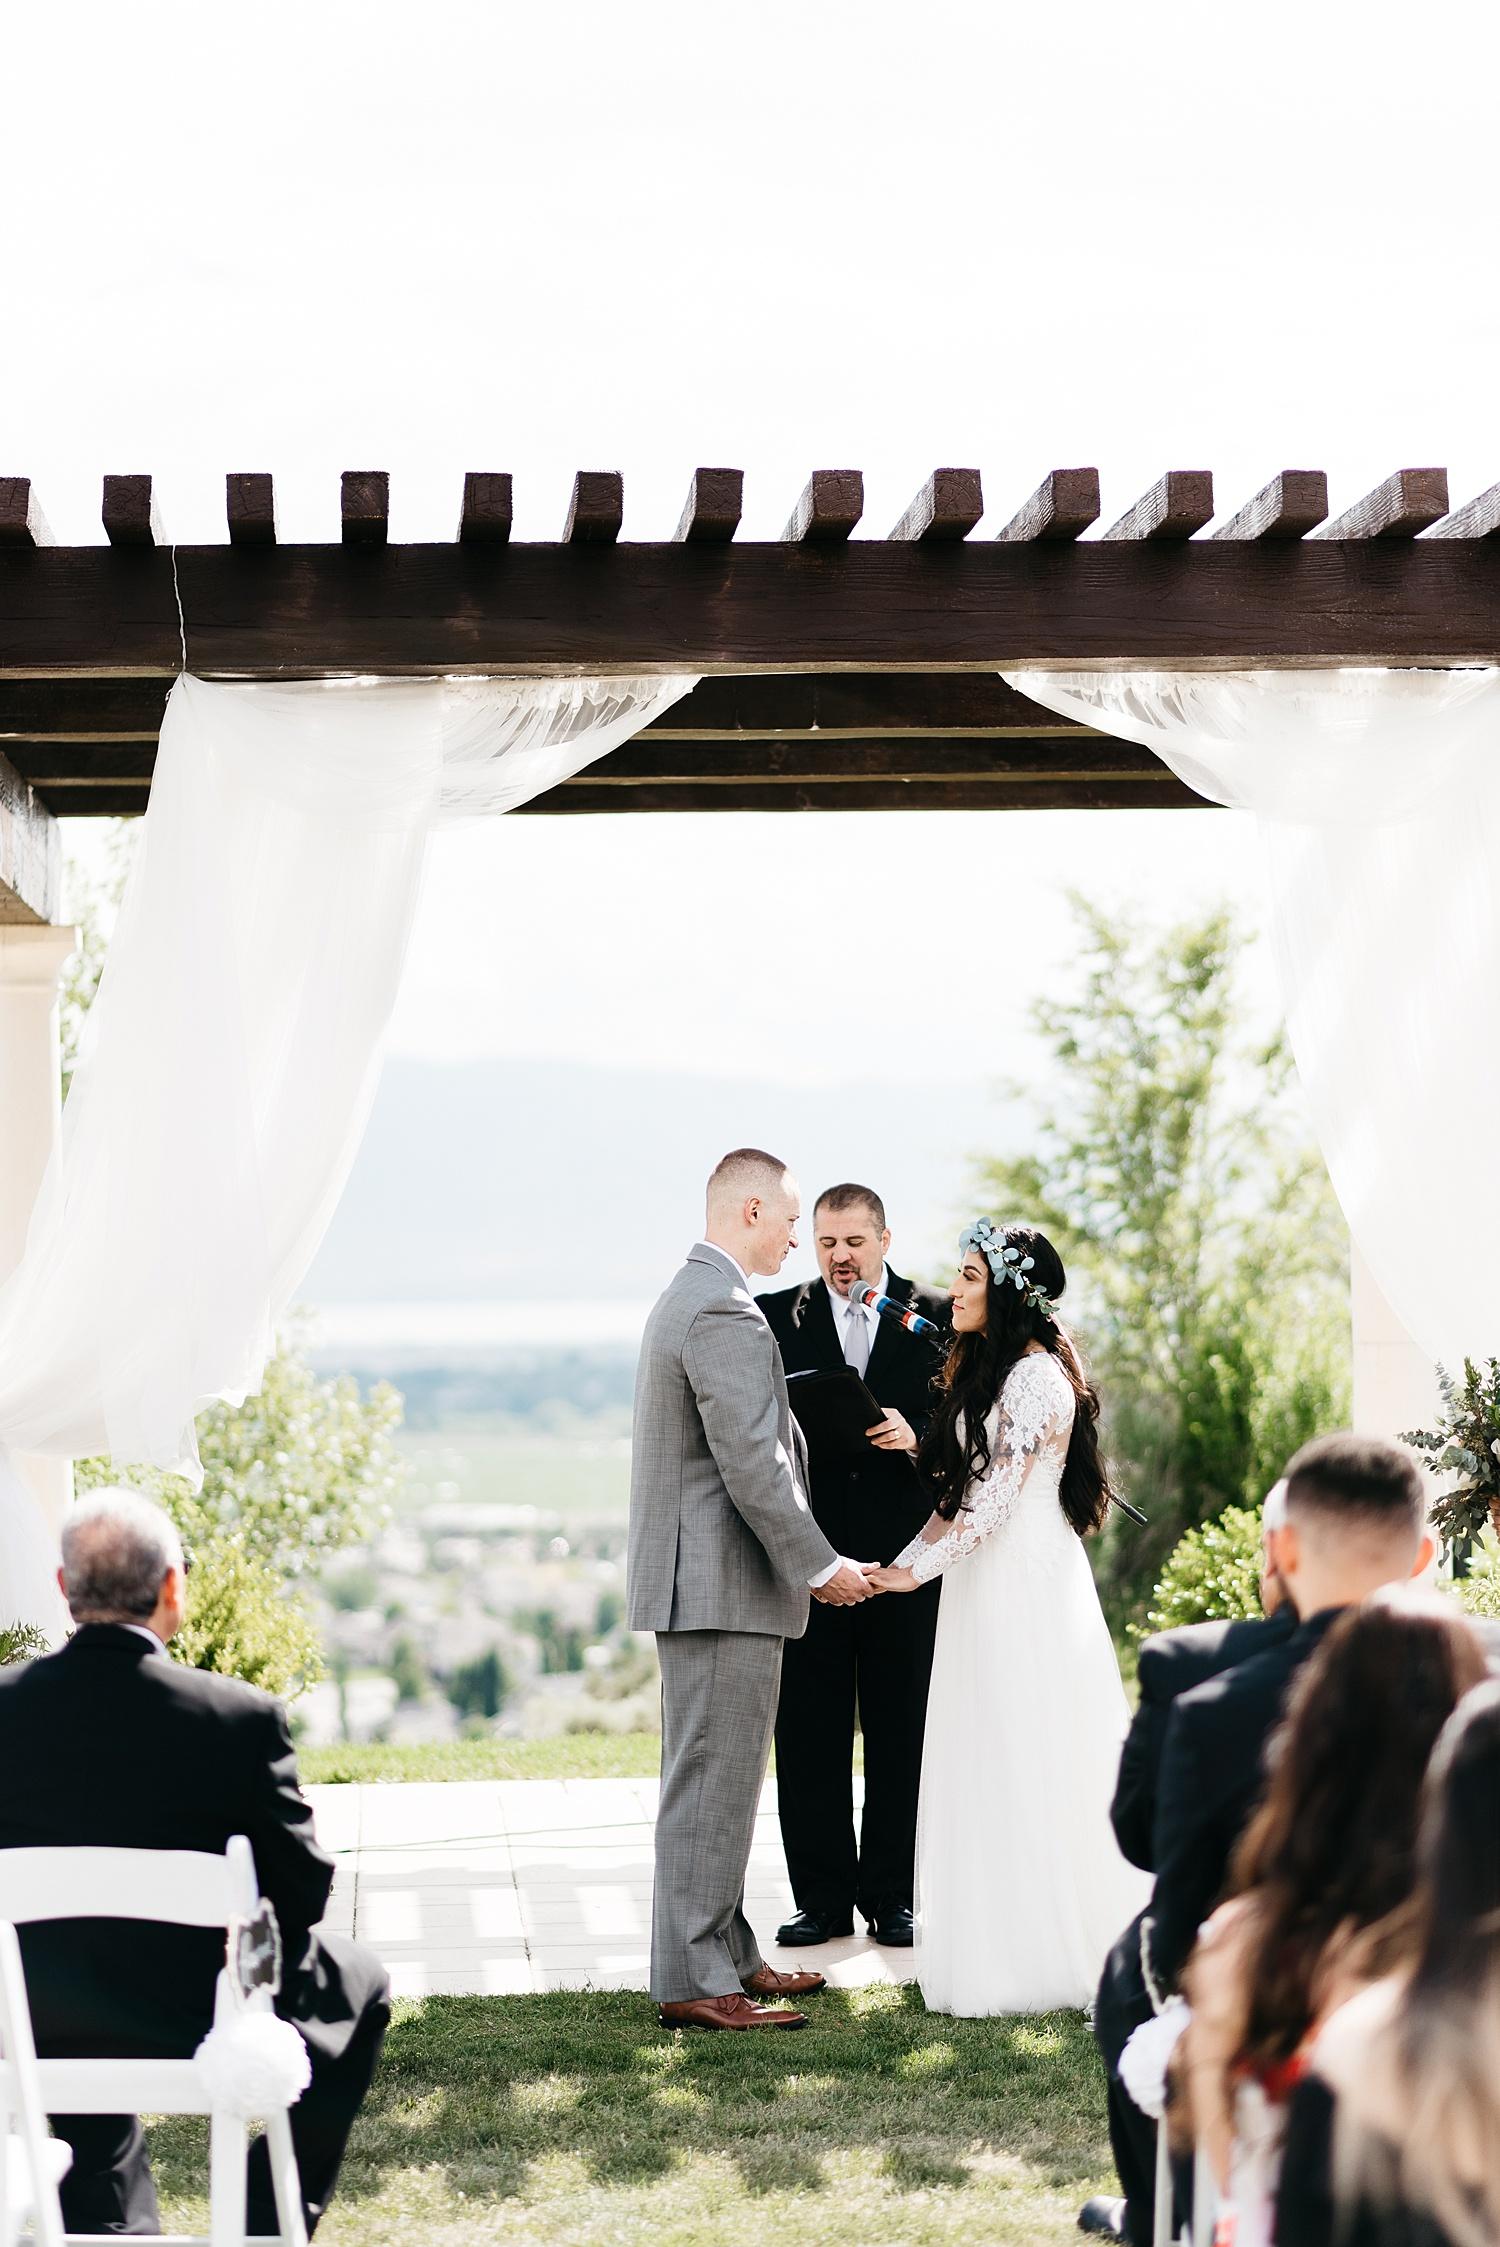 Zandra Barriga Photo - Darian and Colton Wedding_0025.jpg